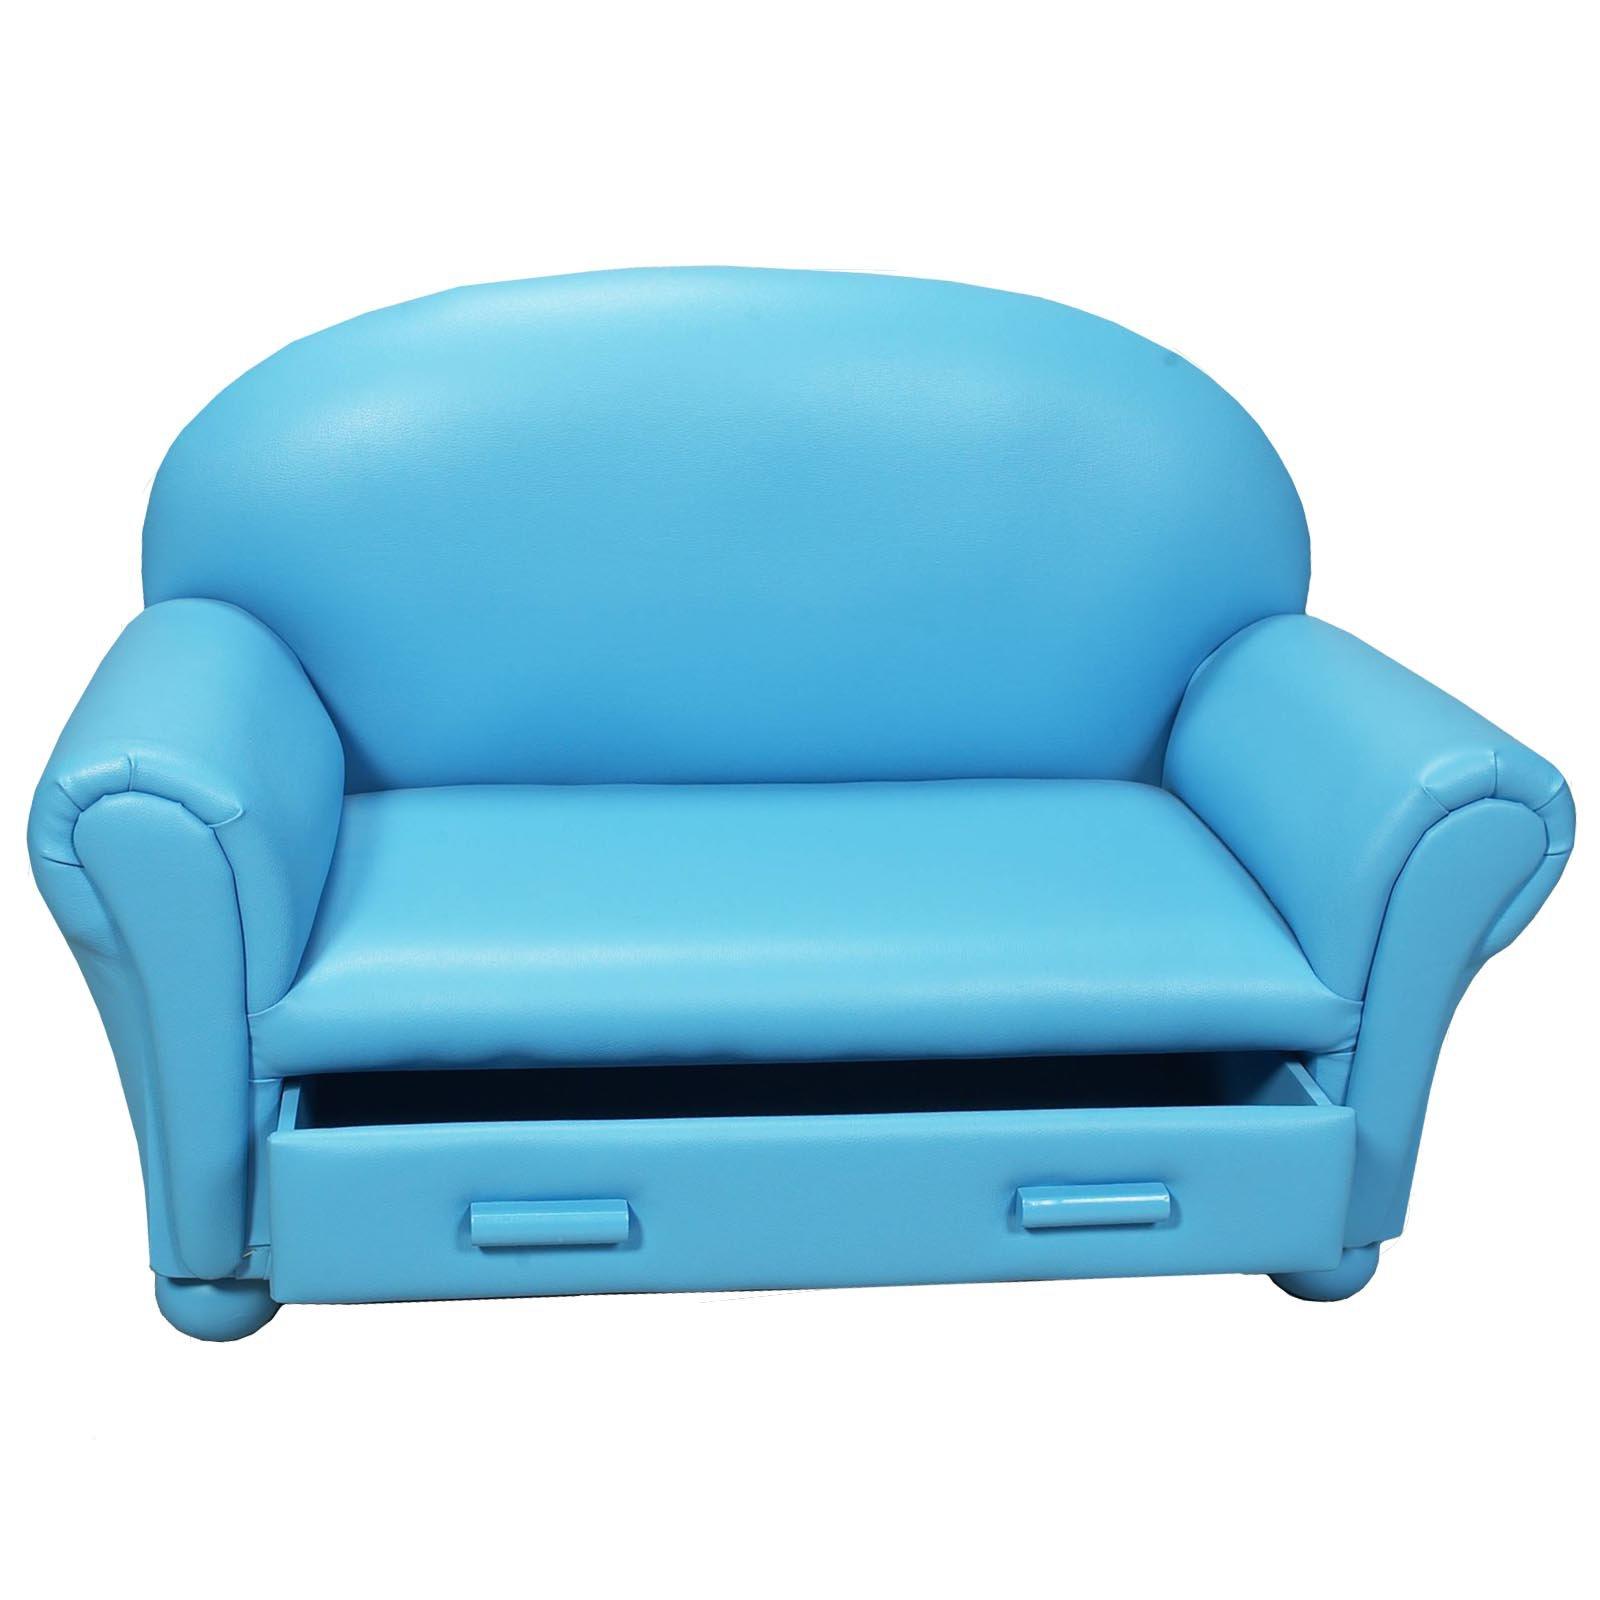 kids sofas childrens sofa with storage drawer - kids upholstered sofas at hayneedle NNIAUGK